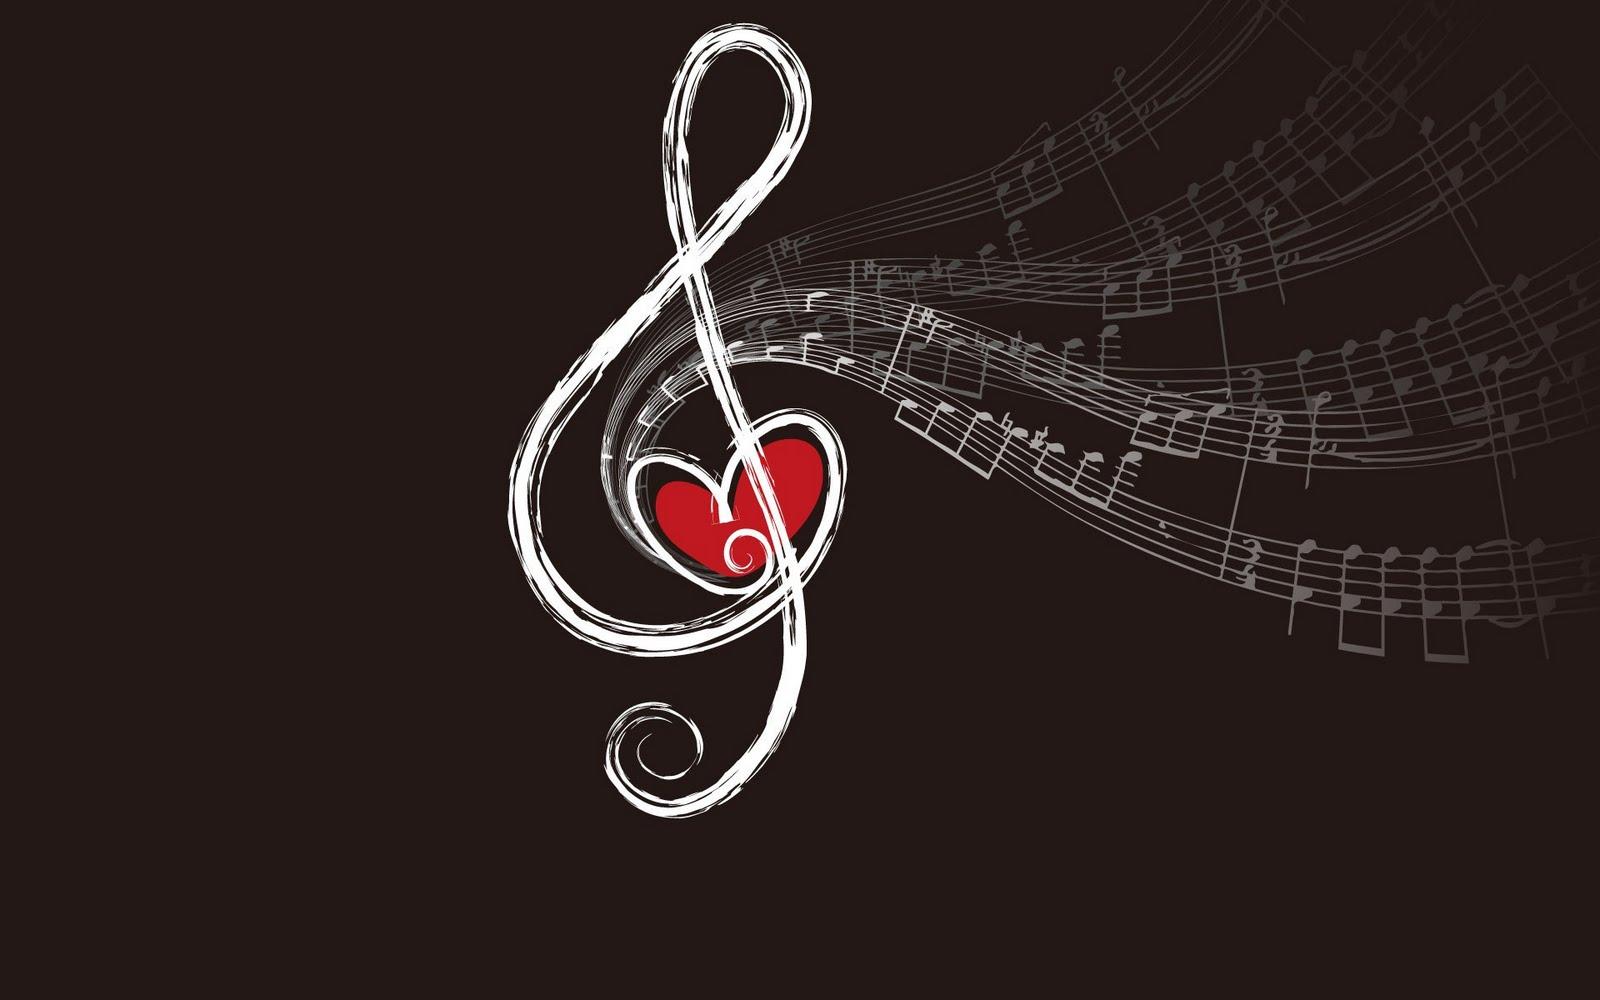 Ground key heart music hd love wallpaper love wallpapers - M r love wallpaper ...